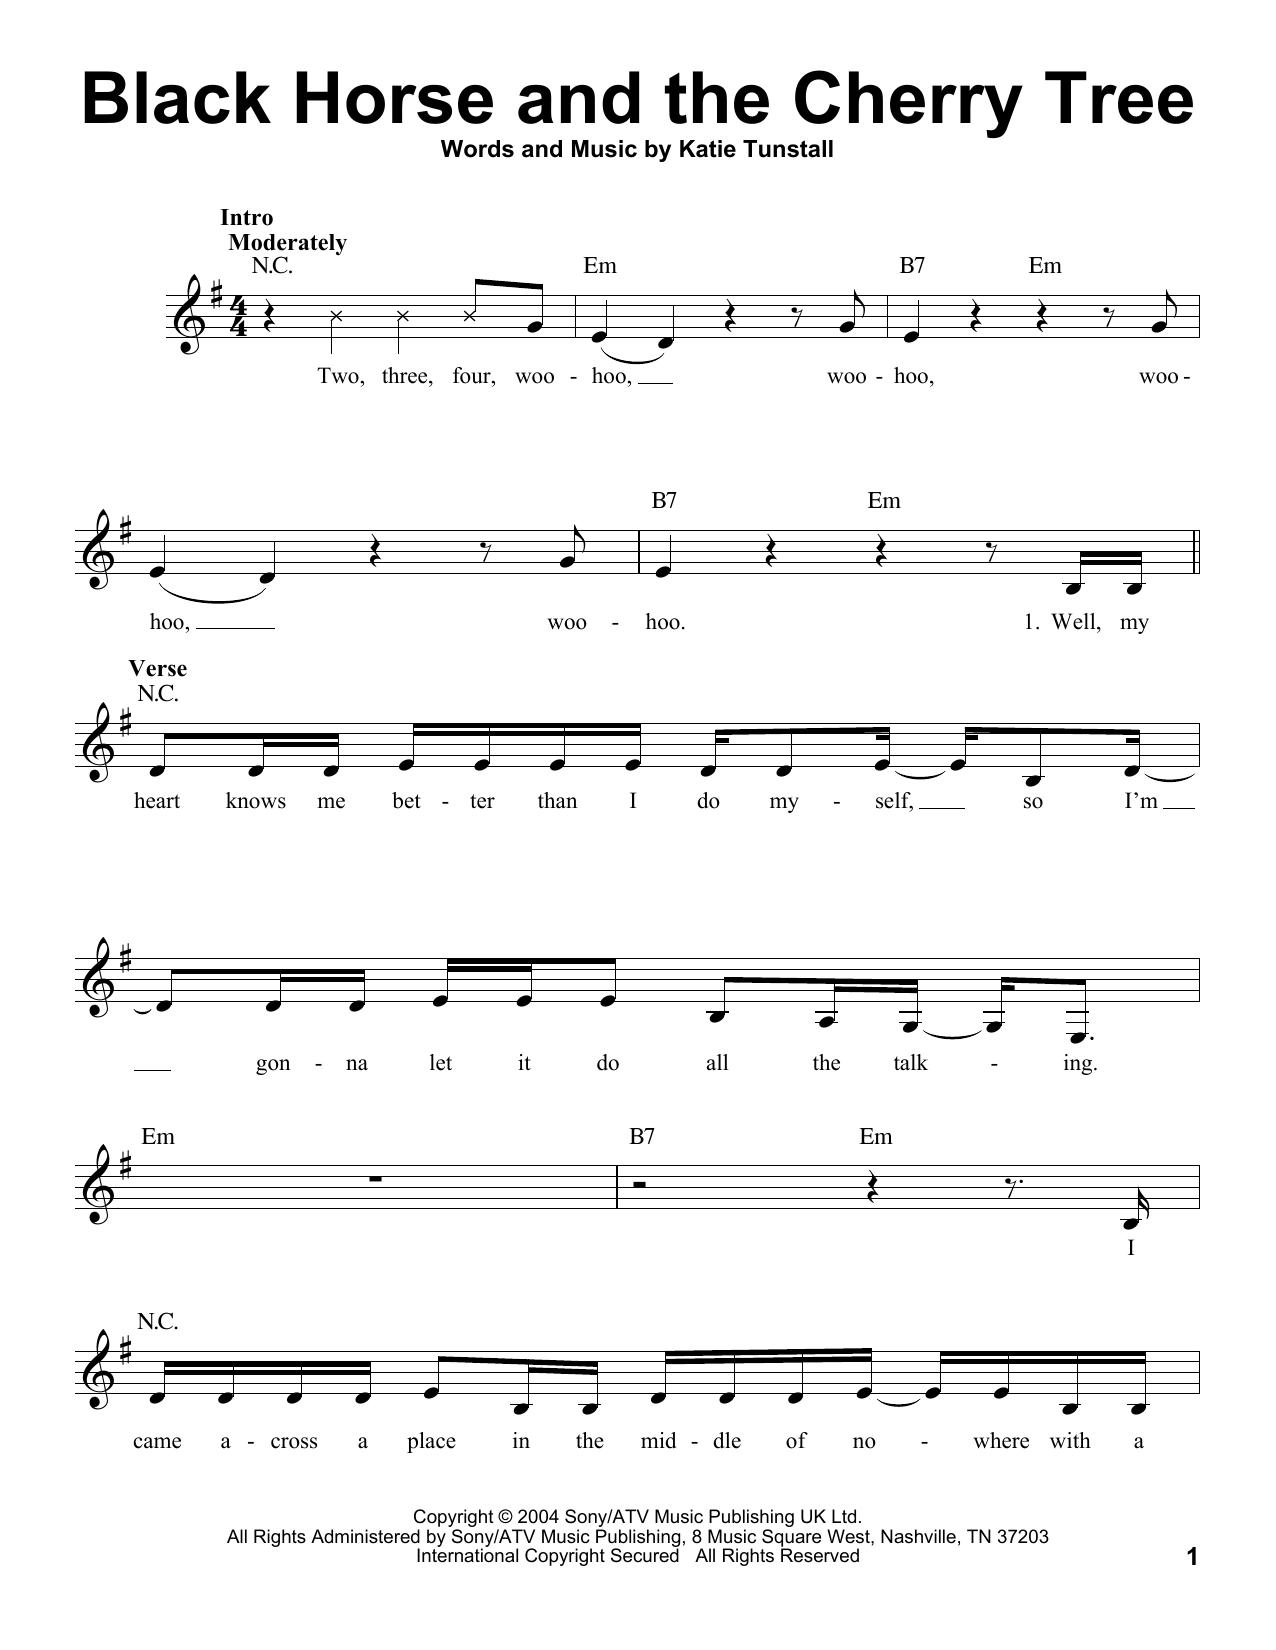 Sheet Music Digital Files To Print Licensed Kt Tunstall Digital